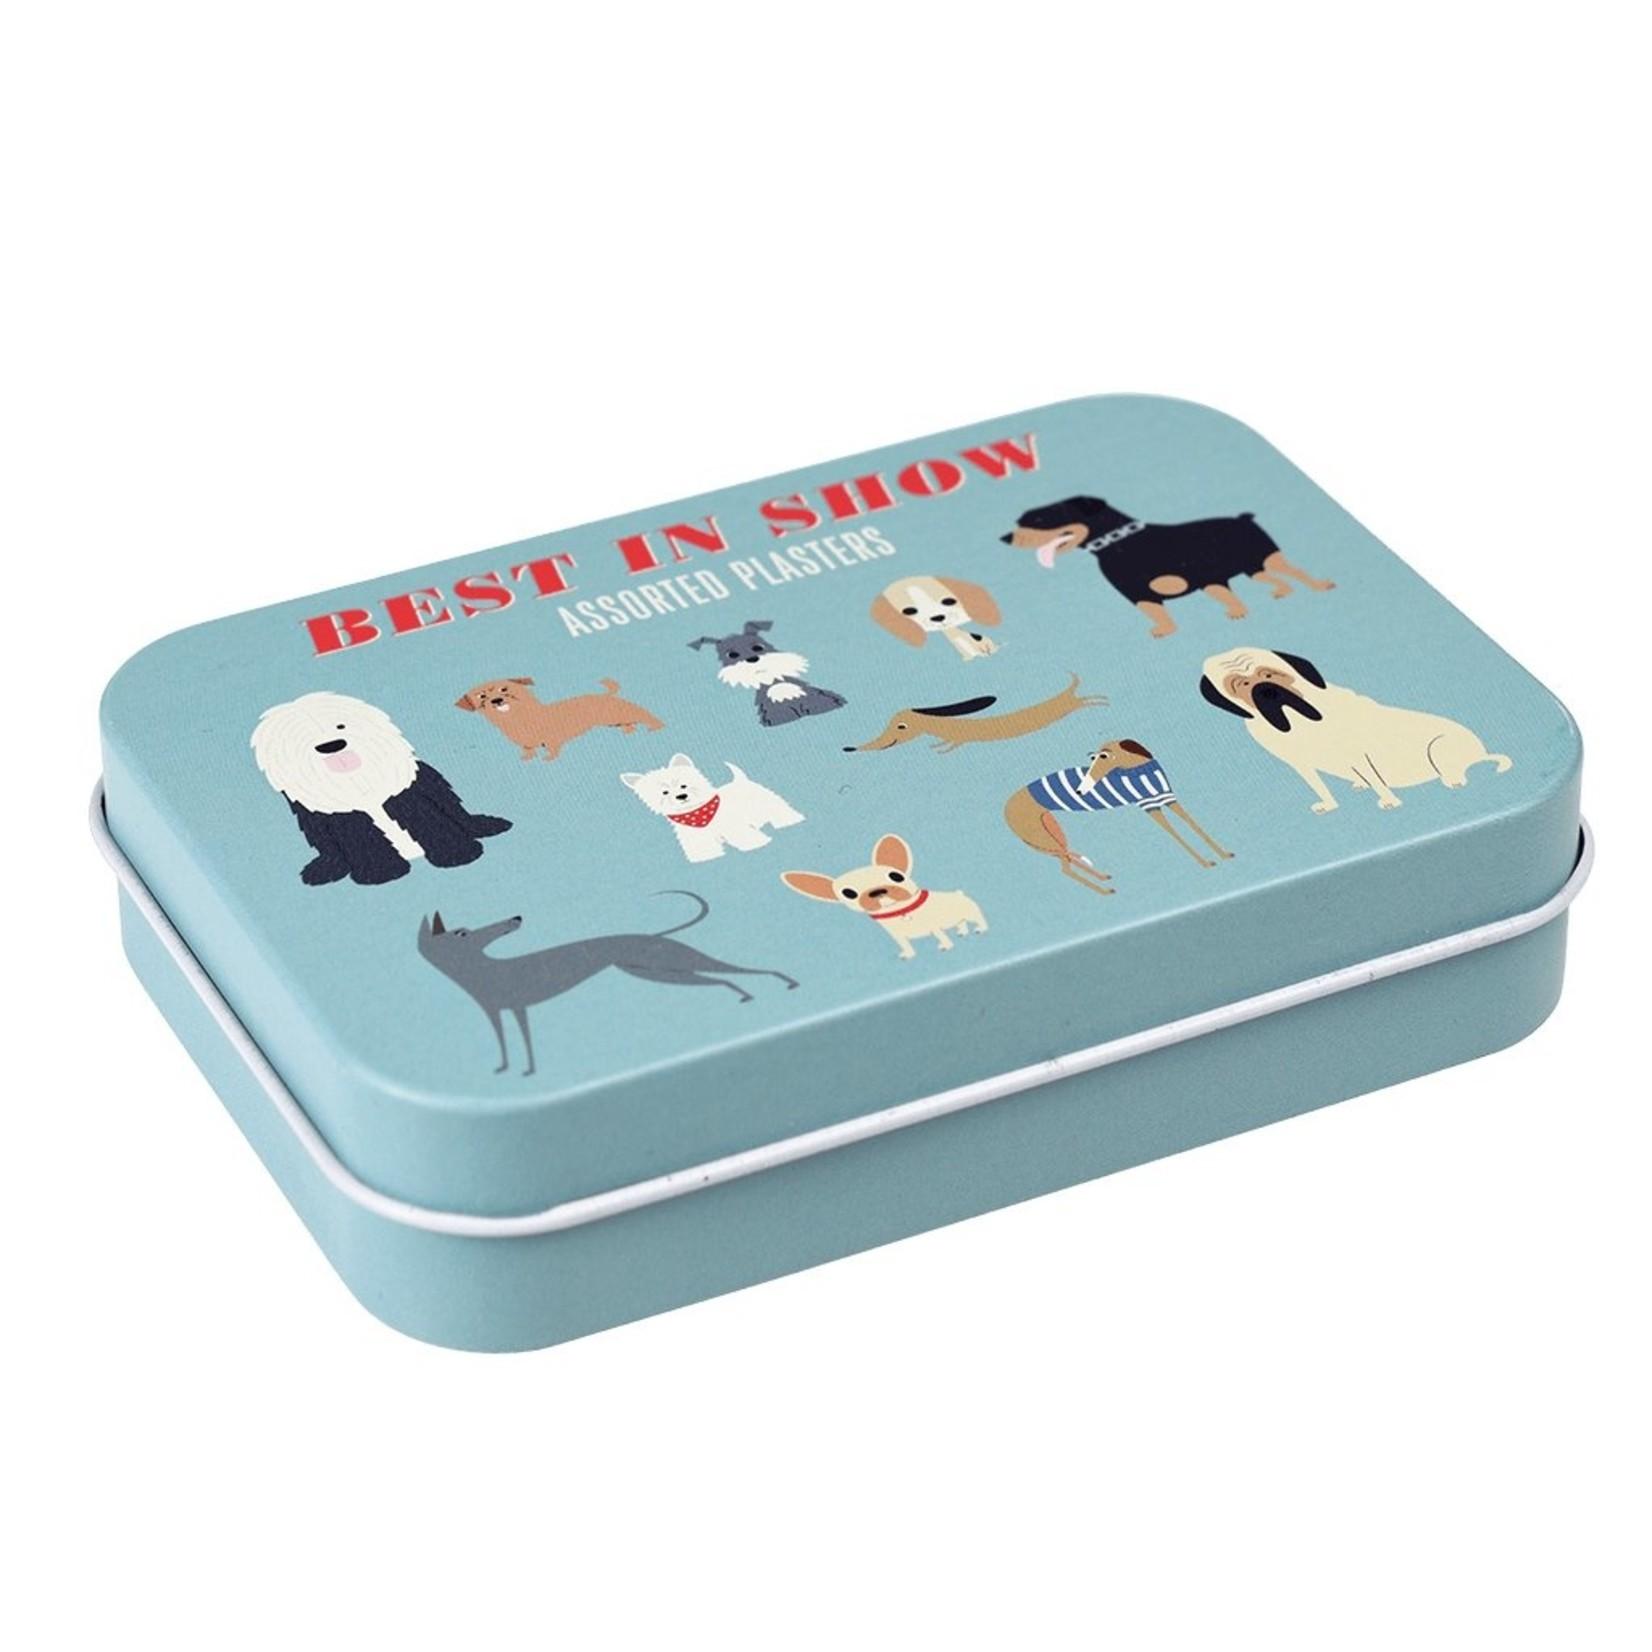 Rex London Pleisterdoosje - Honden - Blauw